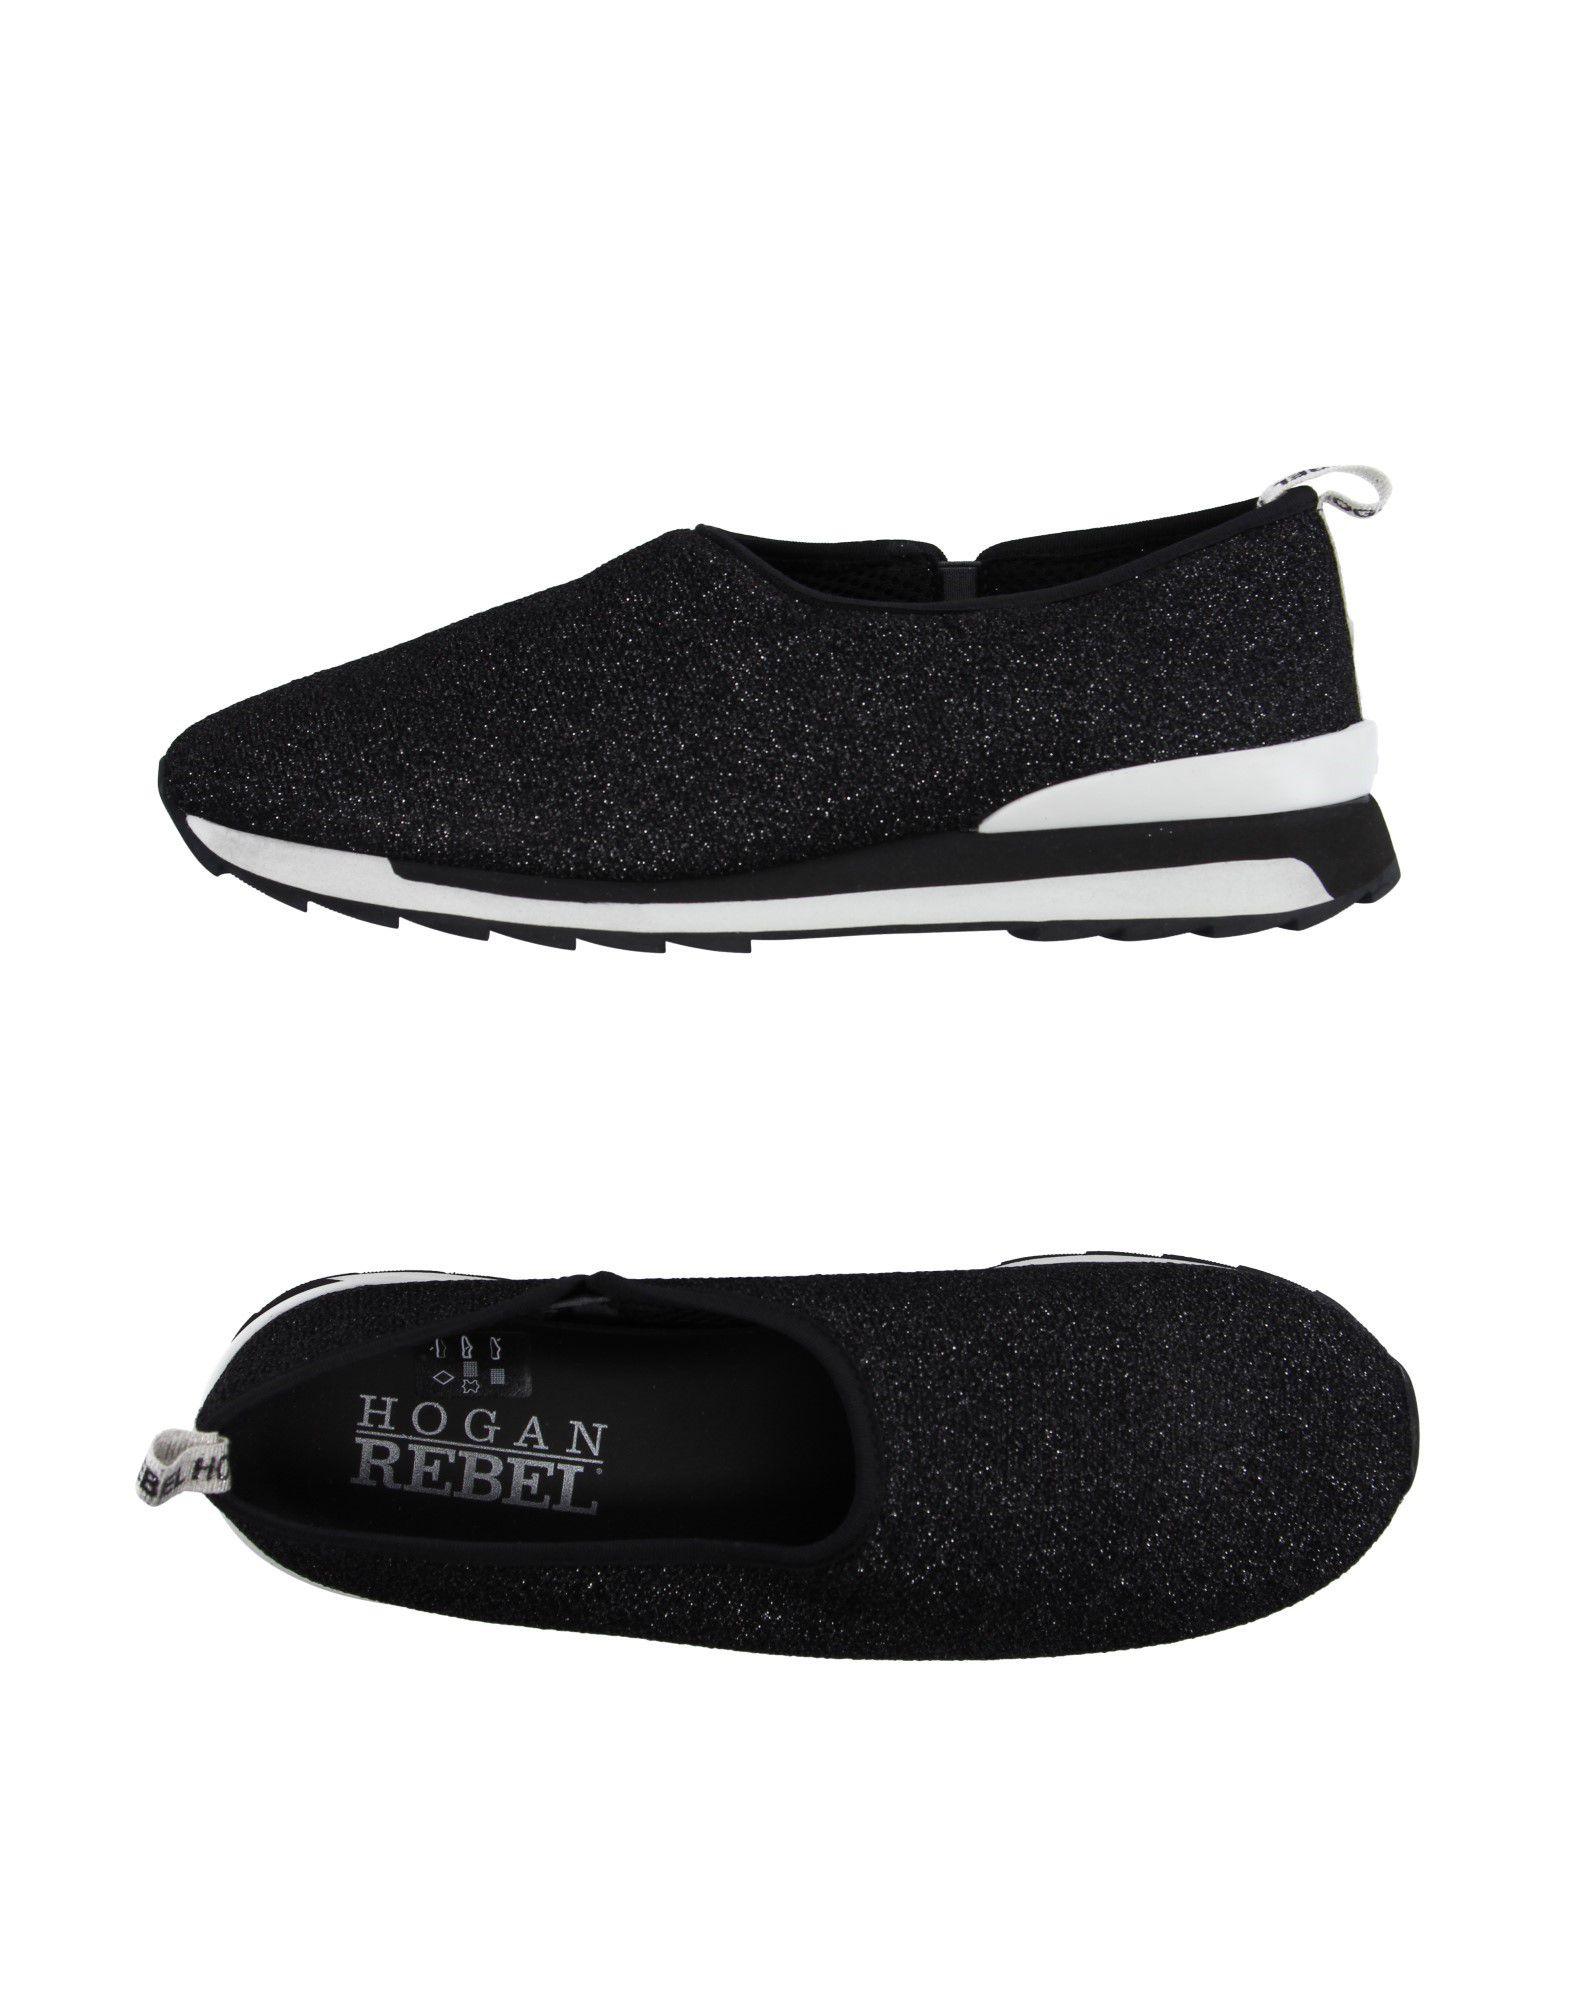 Hogan Rebel Sneakers - Women Hogan  Rebel Sneakers online on  Hogan Australia - 11155561LT 57ea4a